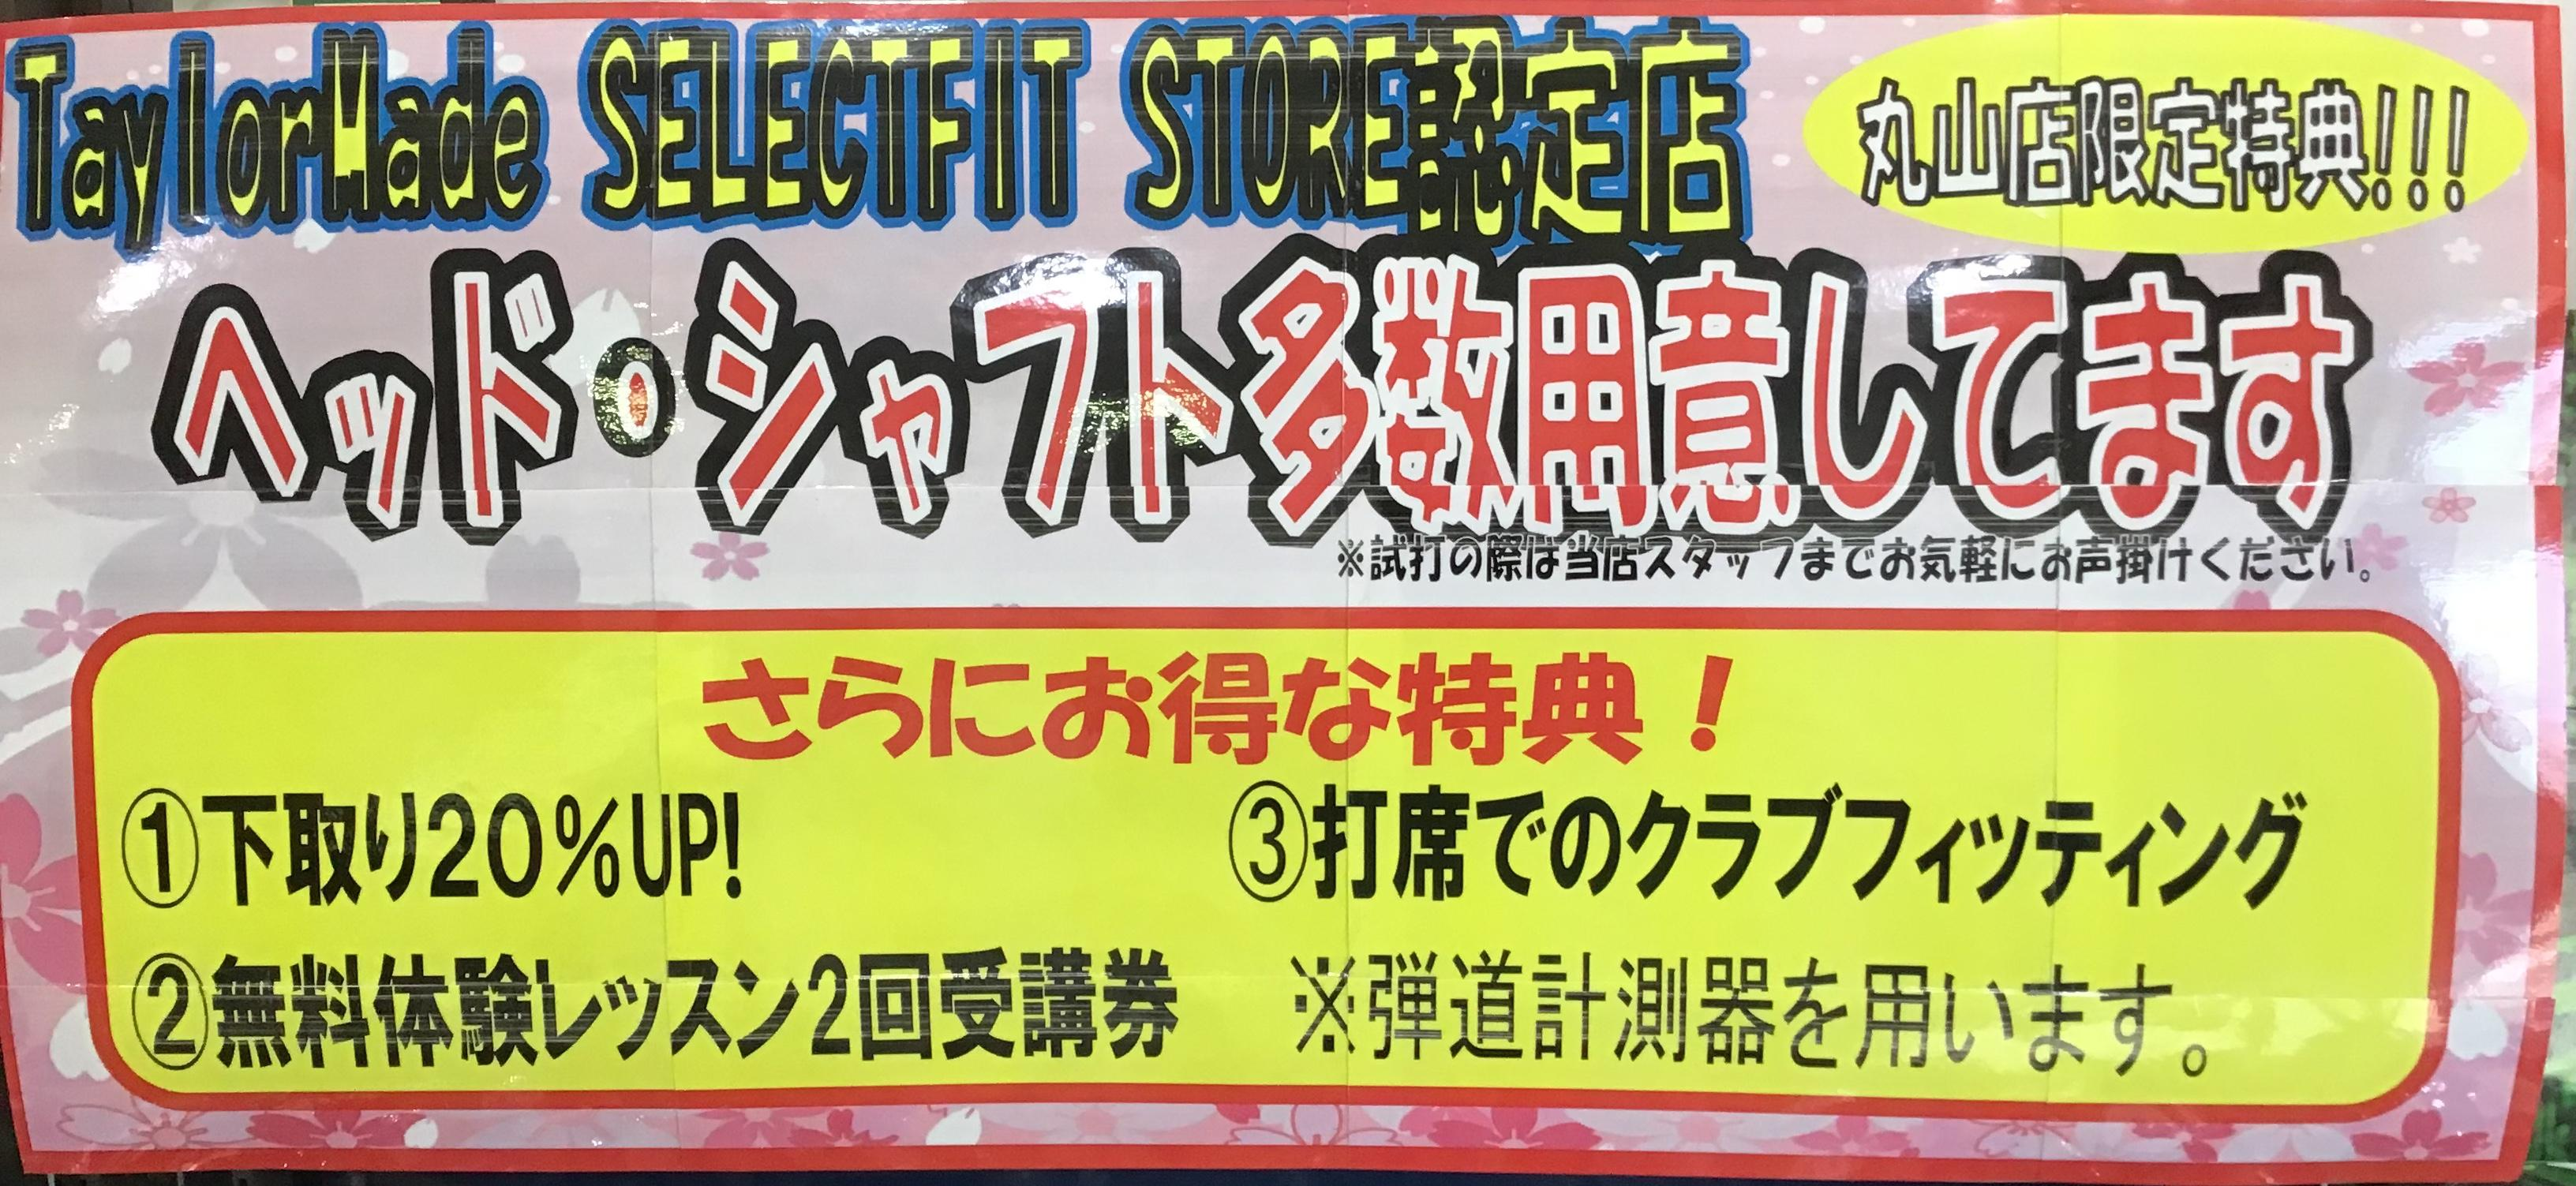 Taylor Made SELECT FIT STORE 認定記念開催!!!